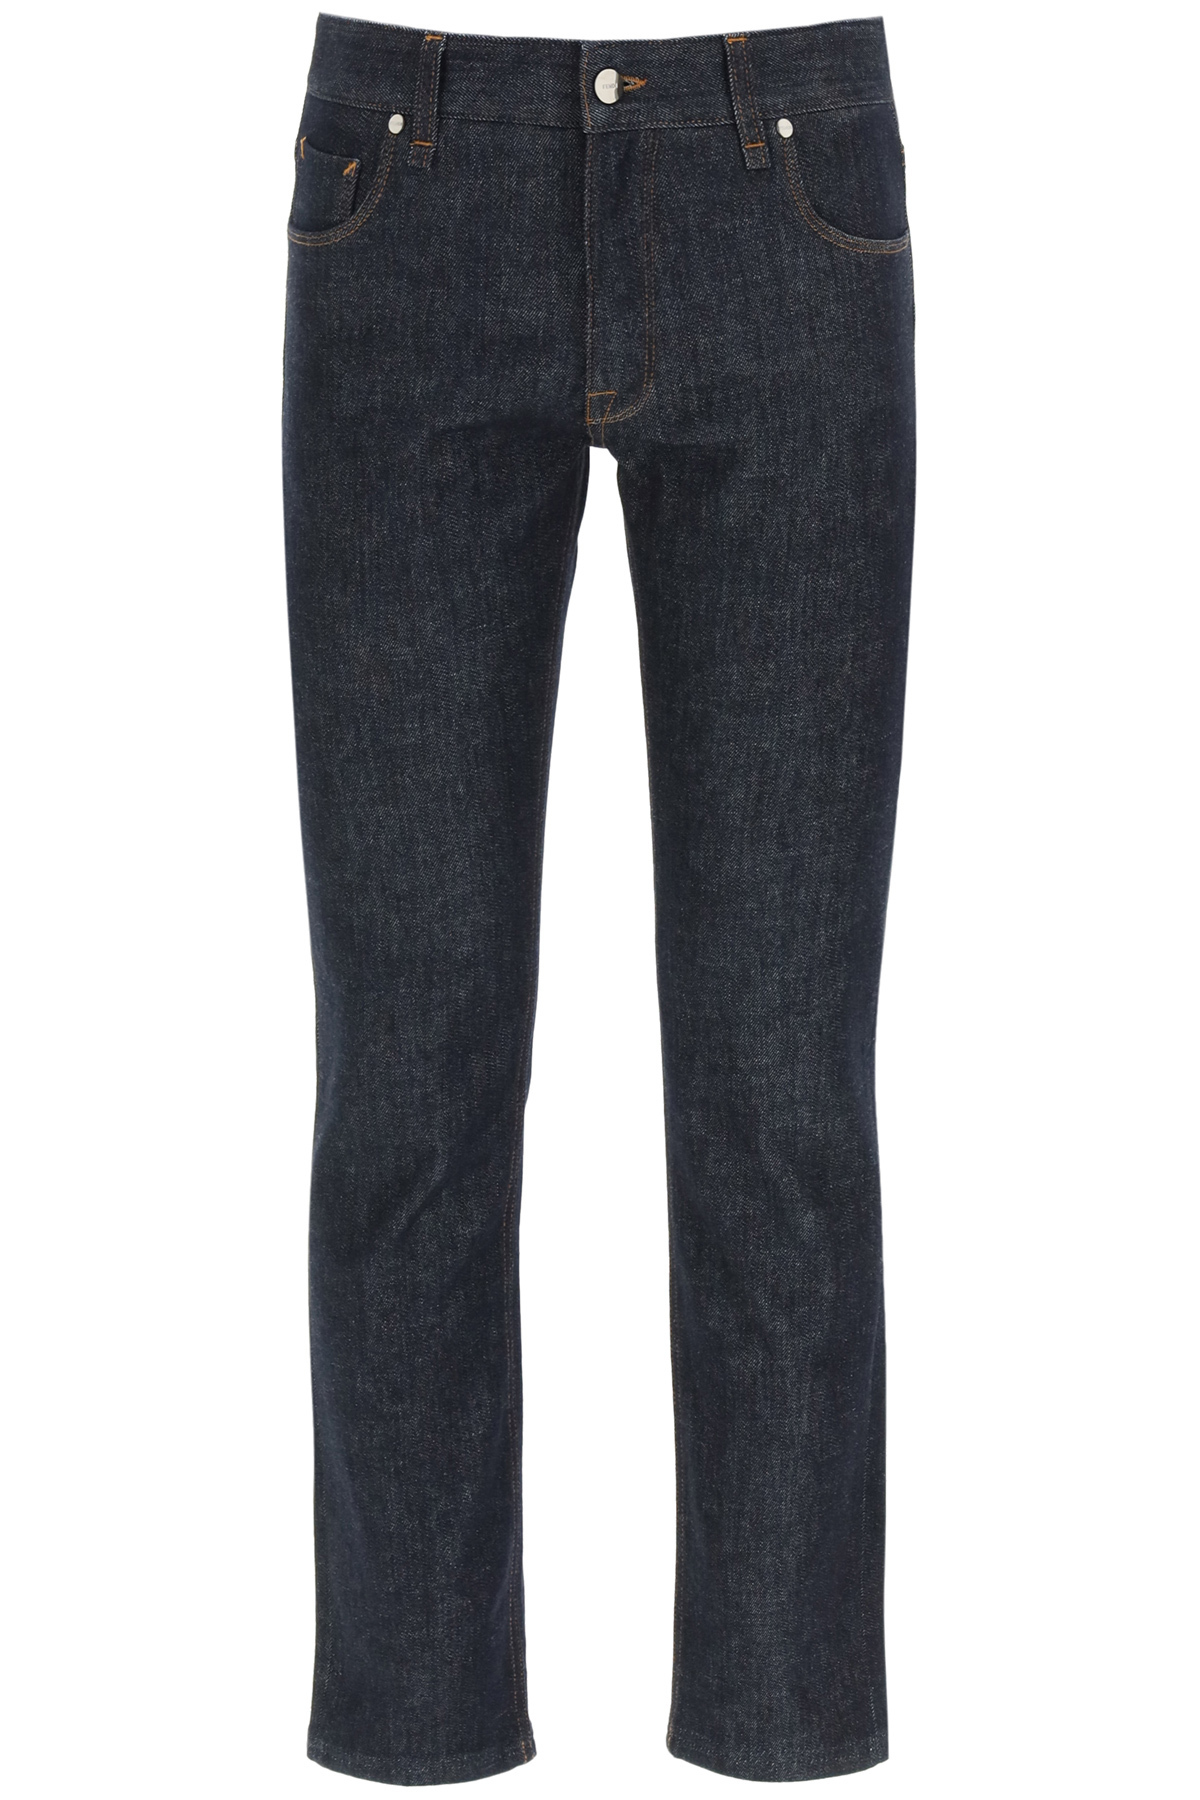 Fendi jeans slim logo ff embossed